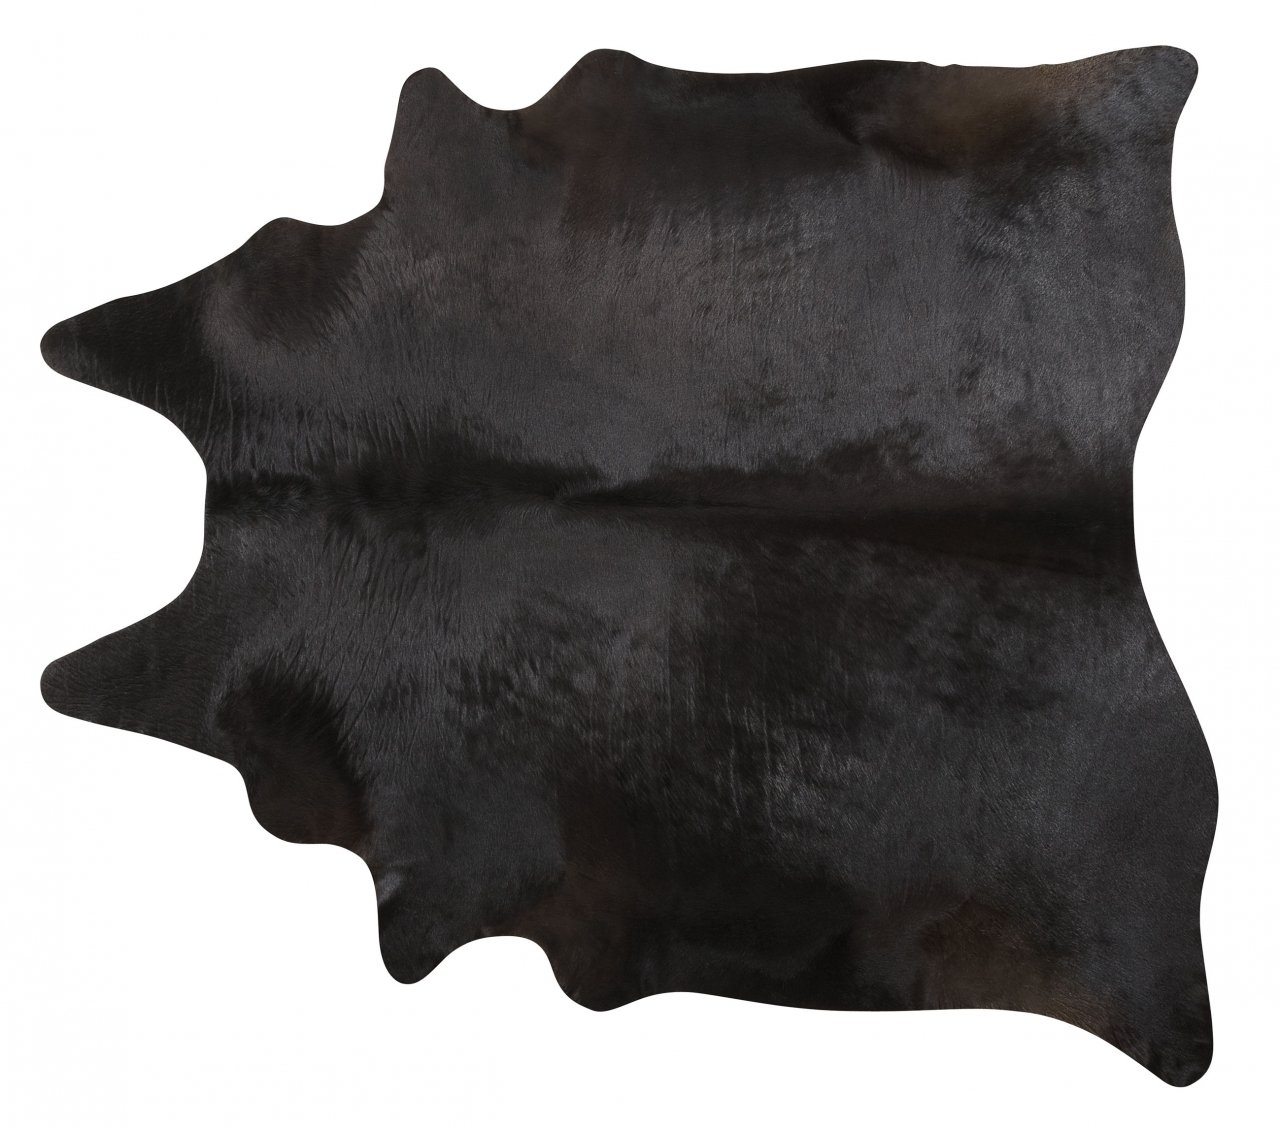 Black Brazilian Cowhide Rug Cow Hide Area Rugs Skin Leather Size XL